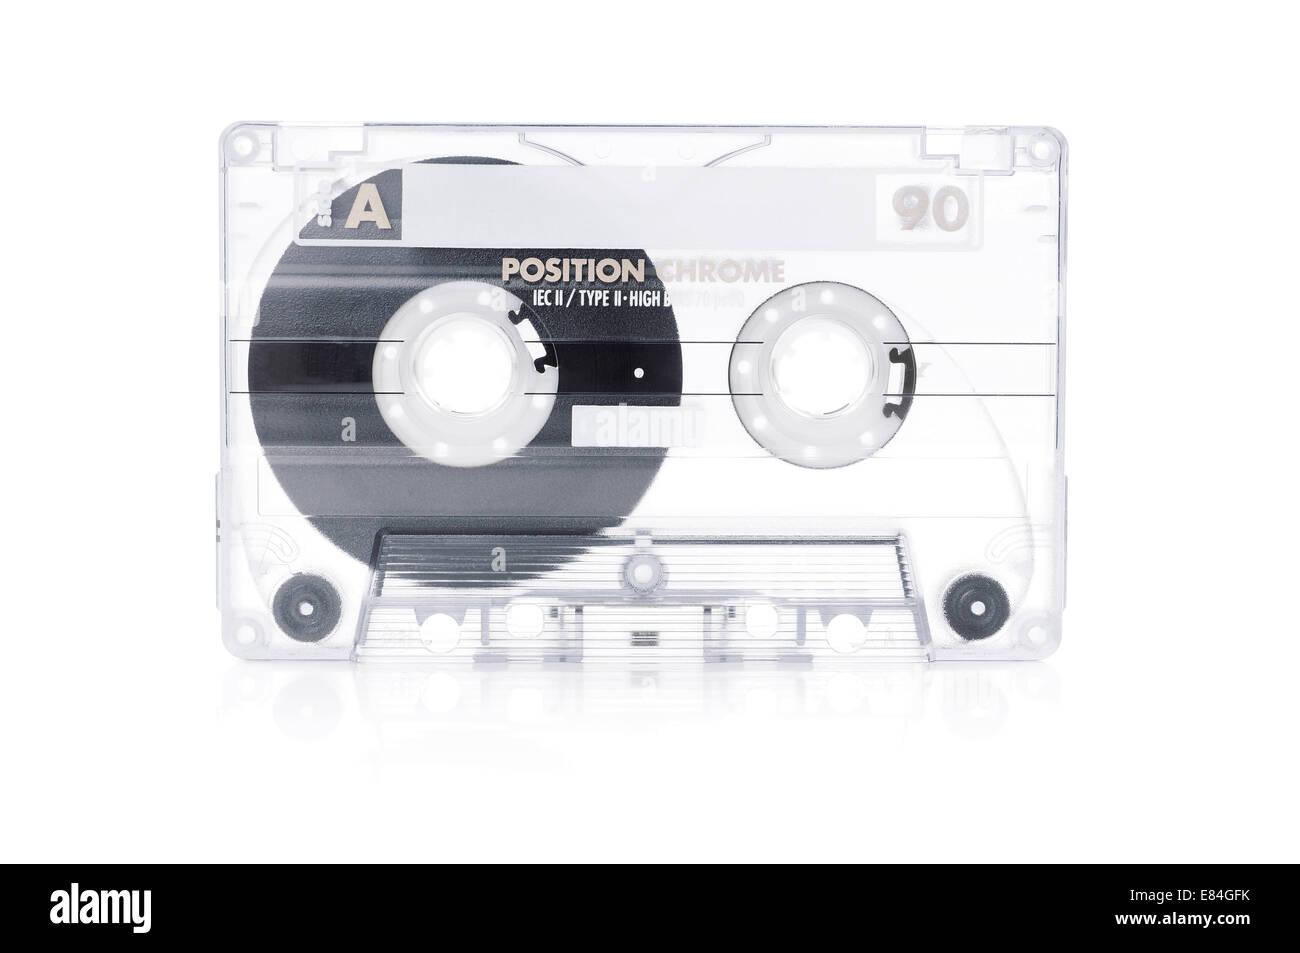 tape cassette photos tape cassette images alamy. Black Bedroom Furniture Sets. Home Design Ideas